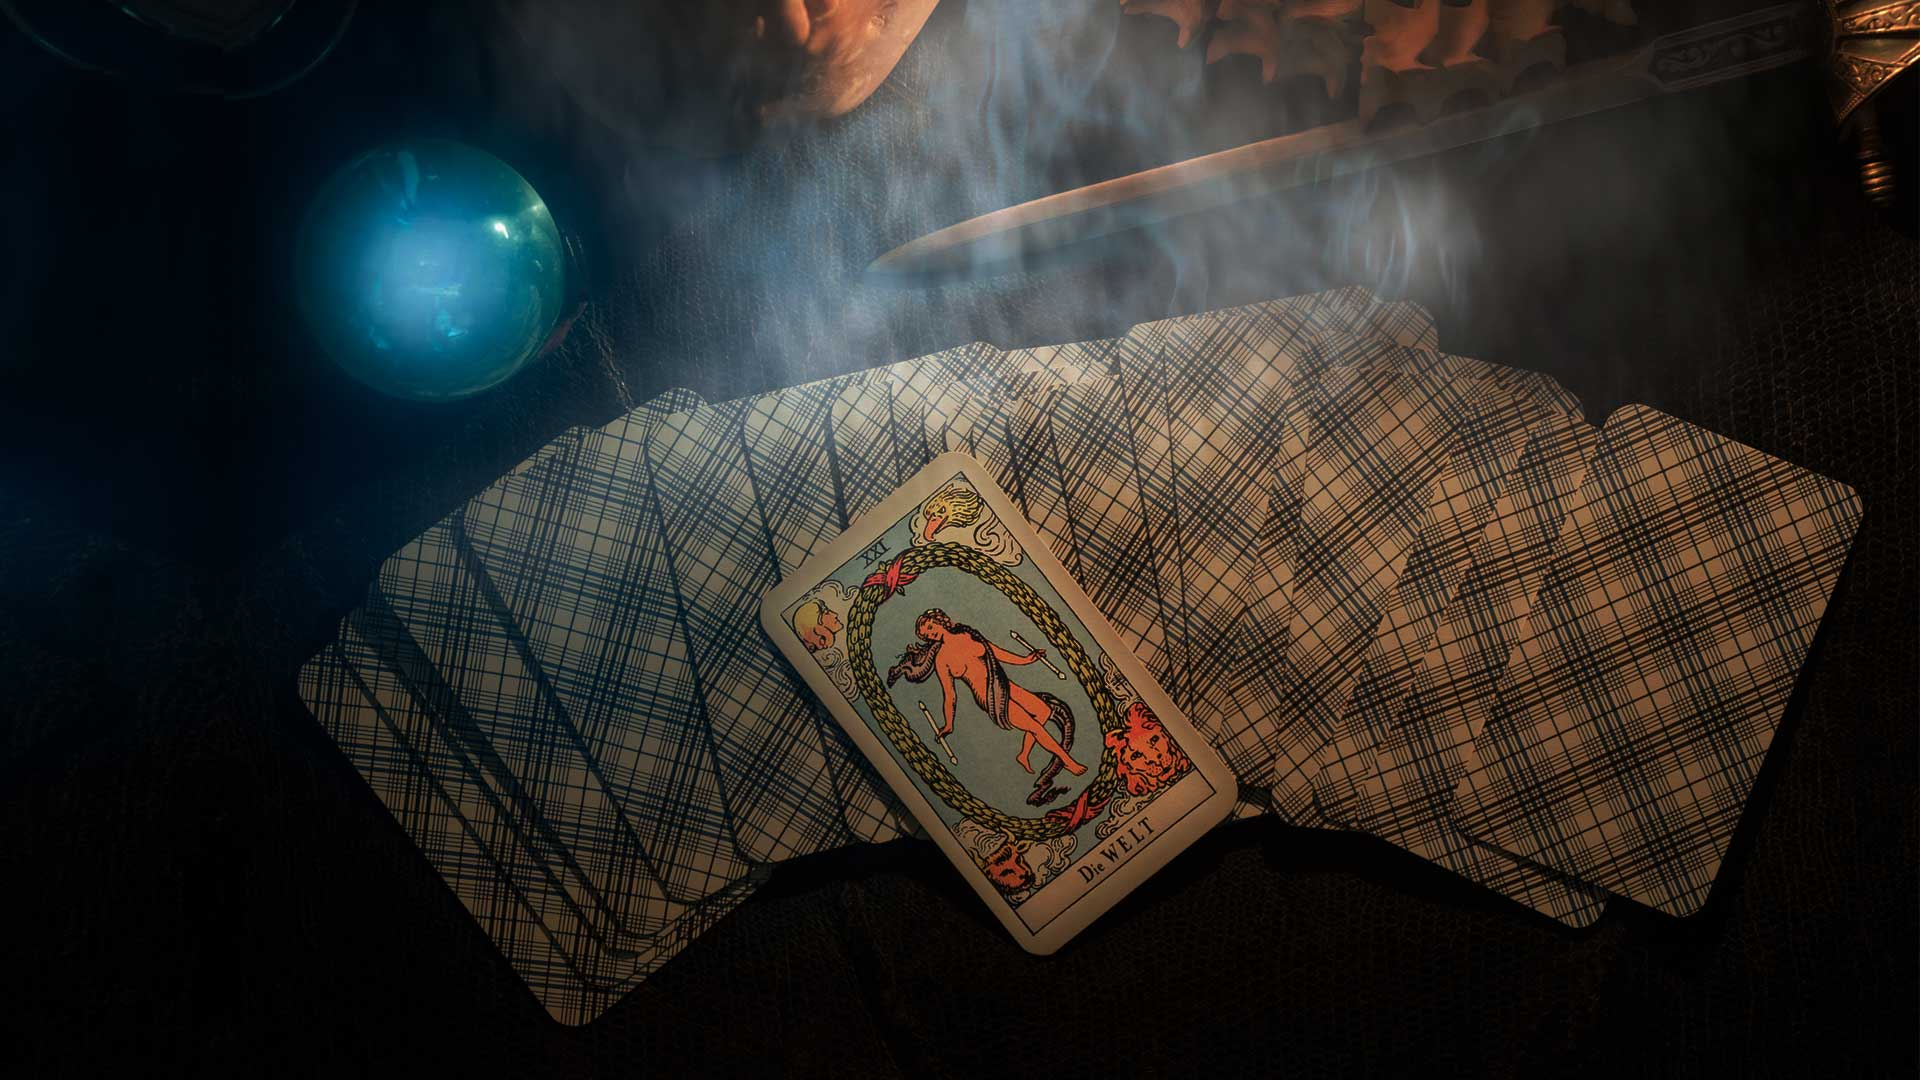 Zoltar Spricht Big Film Tarot Zirkus Escape Room Essen